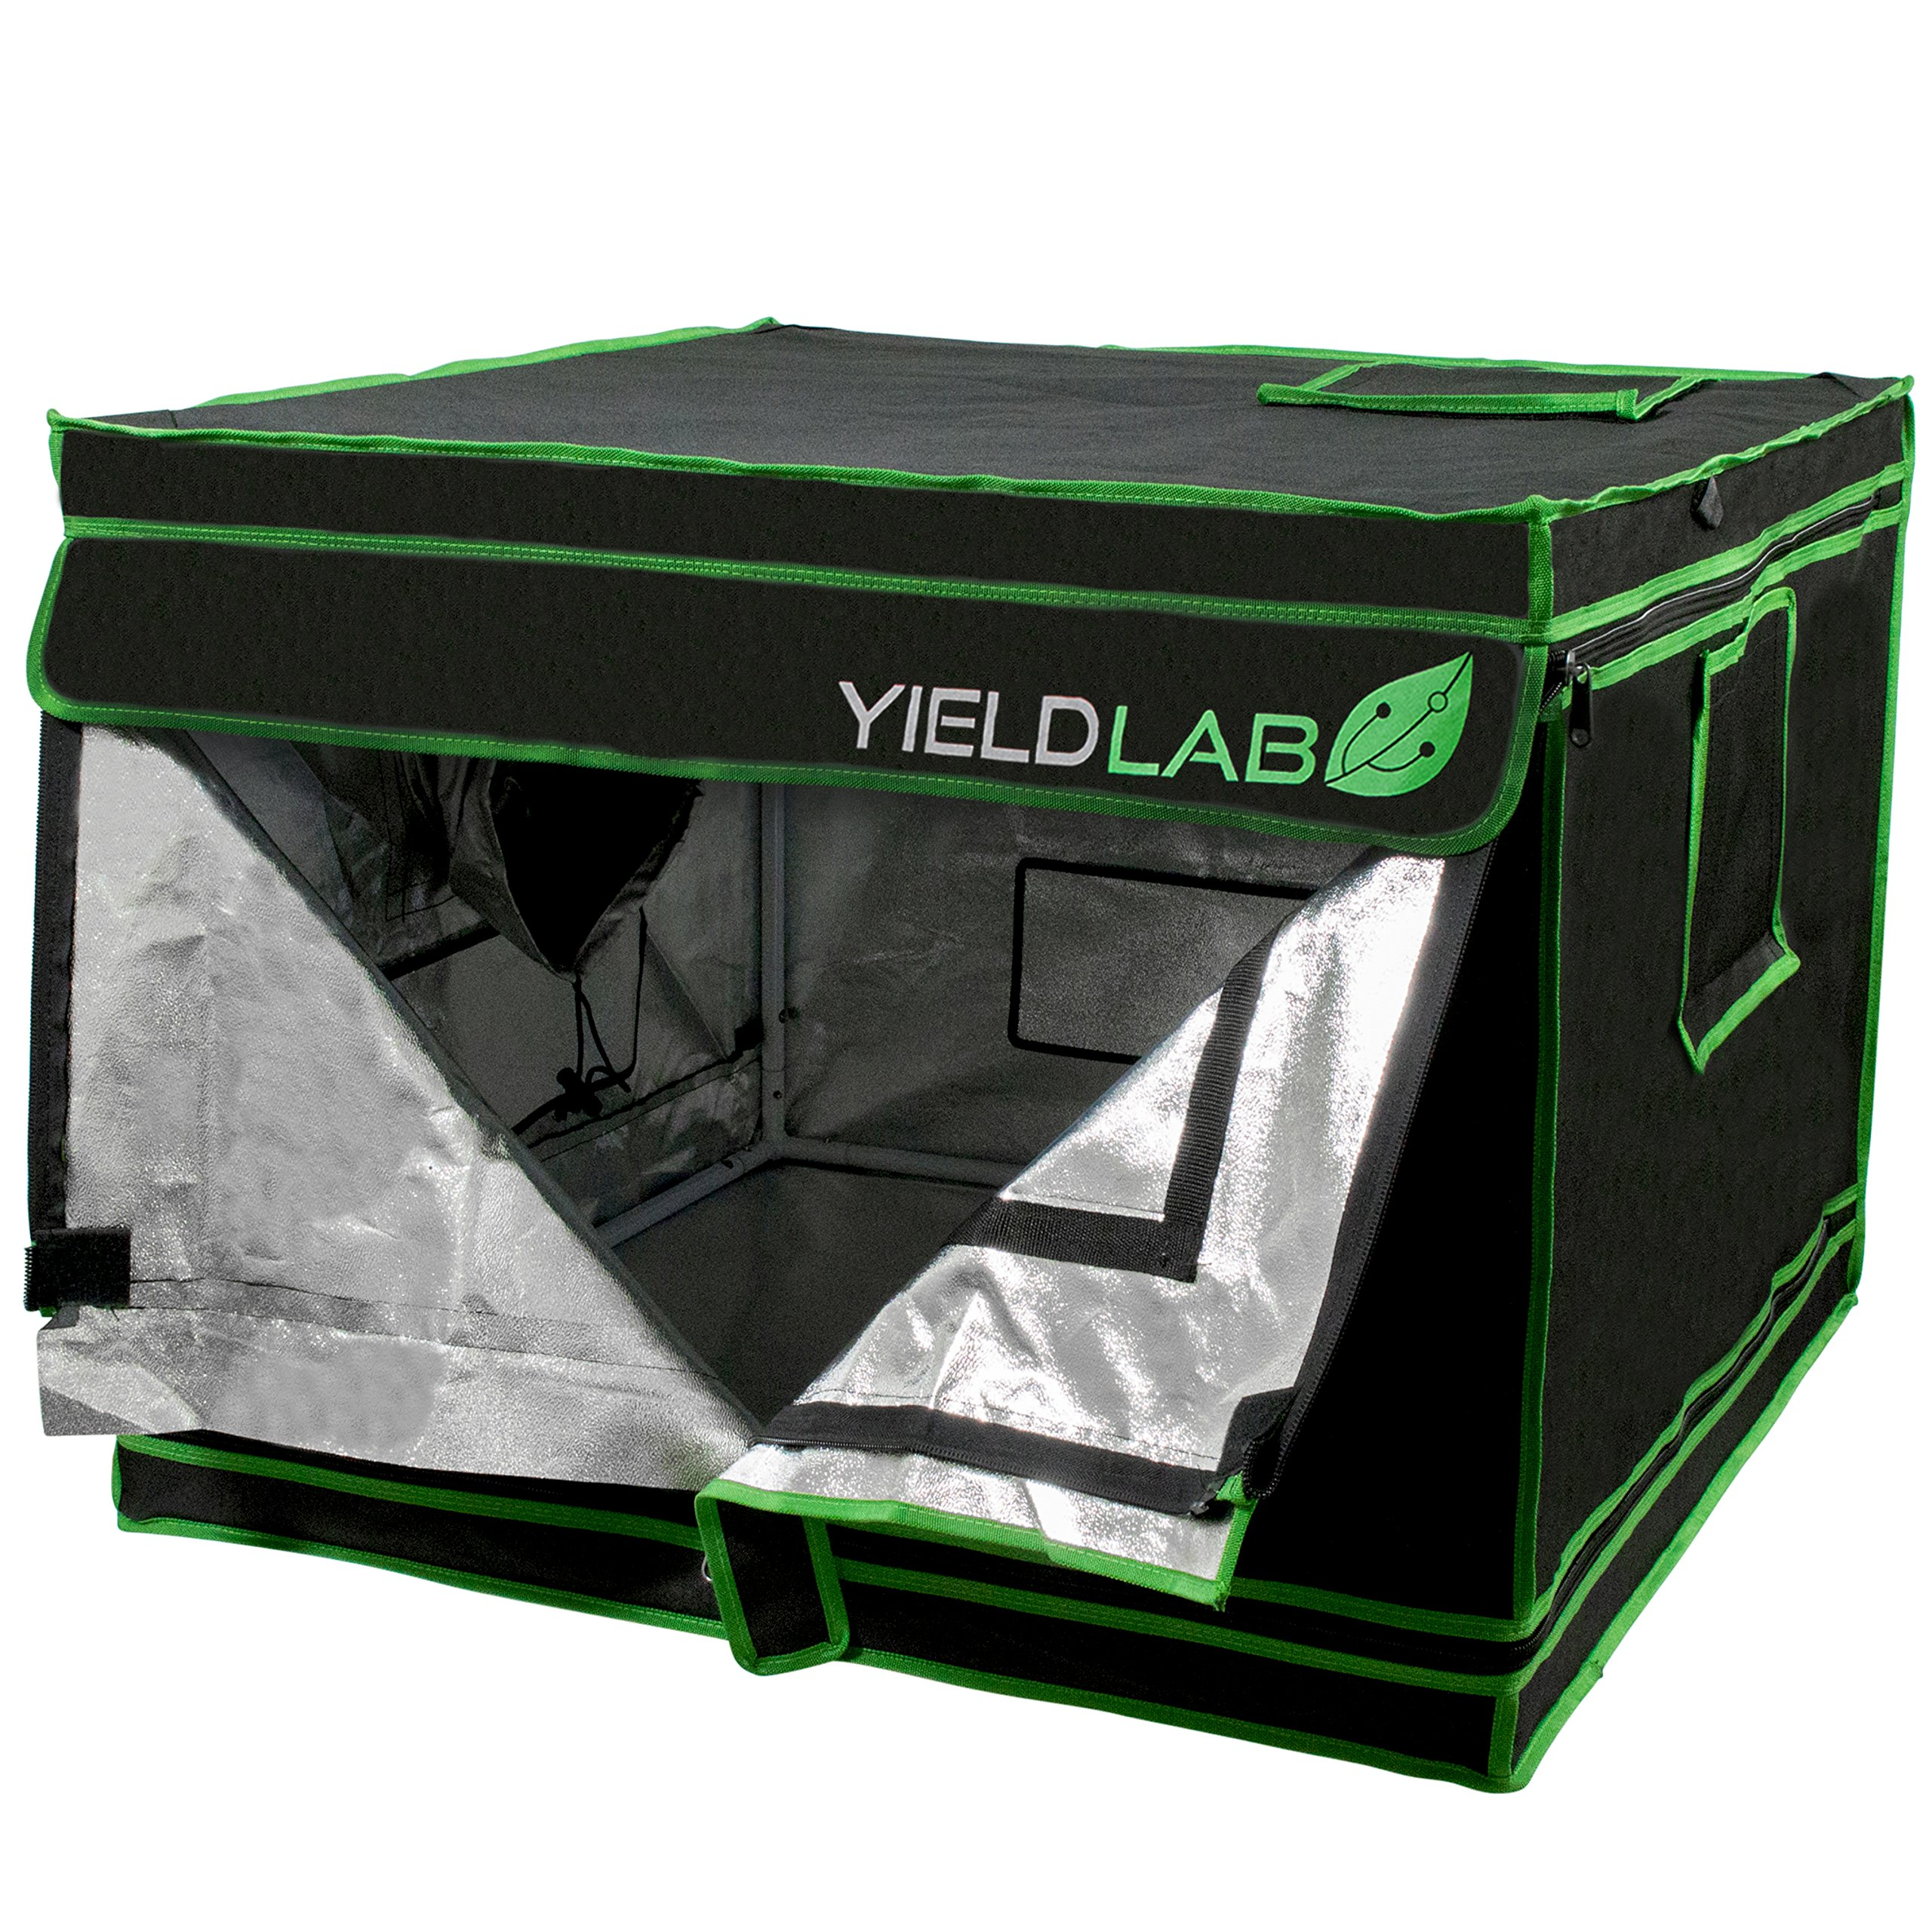 Yield Lab Grow Tent